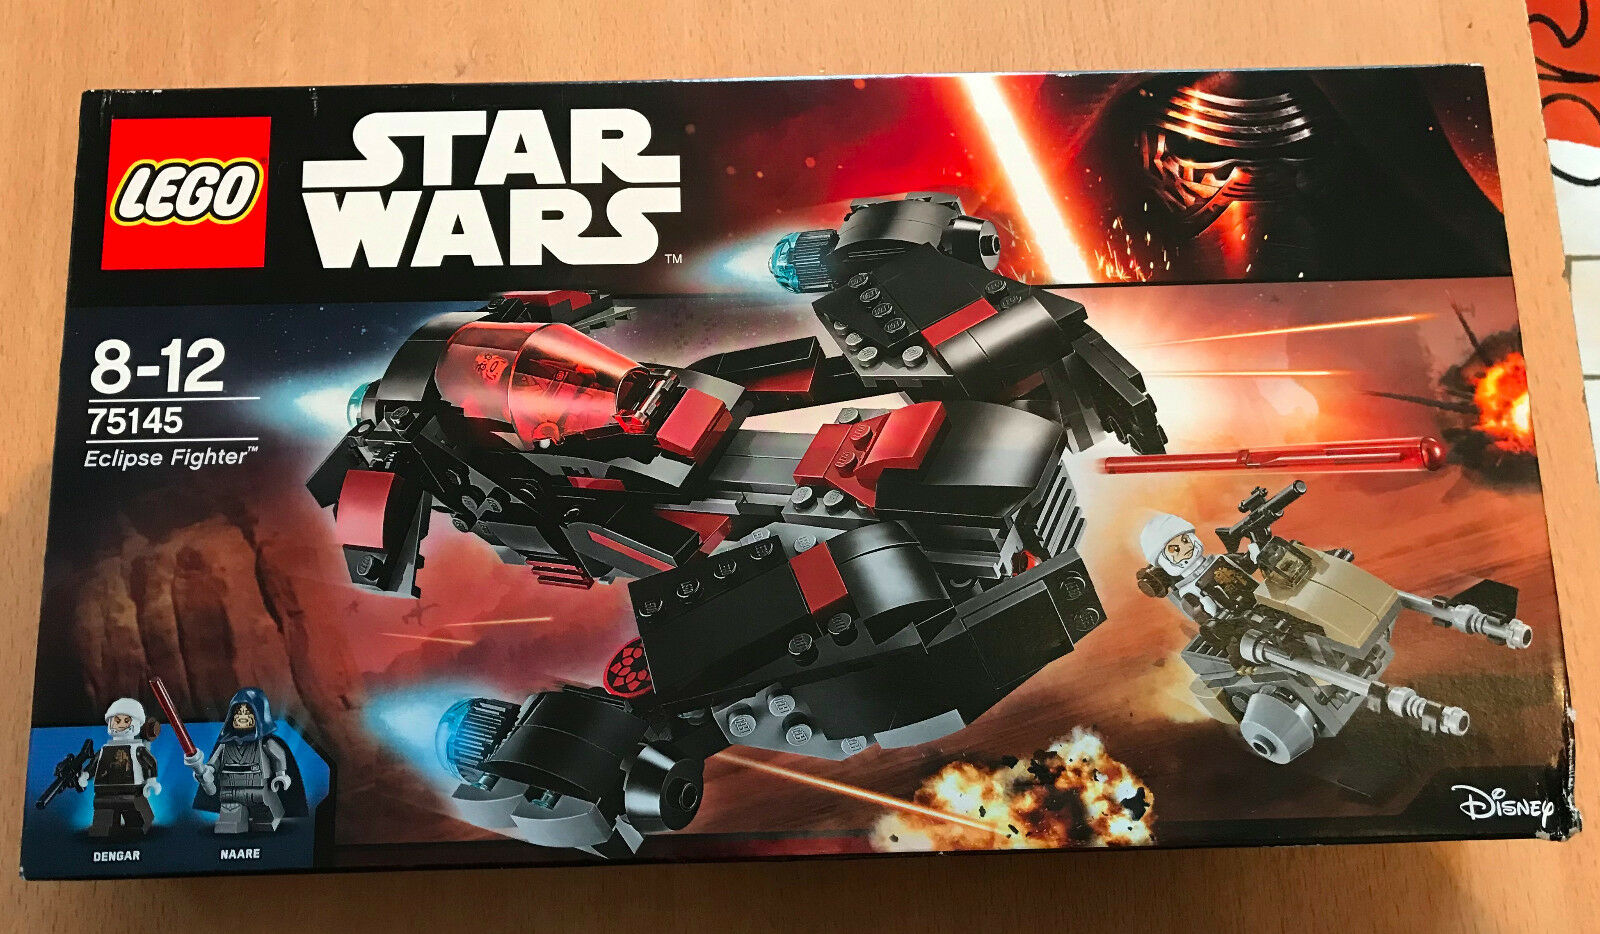 LEGO SET BOITE NEUF STAR WARS VAISSEAU 75145 ECLIPSE FIGHTER AVEC DENGAR